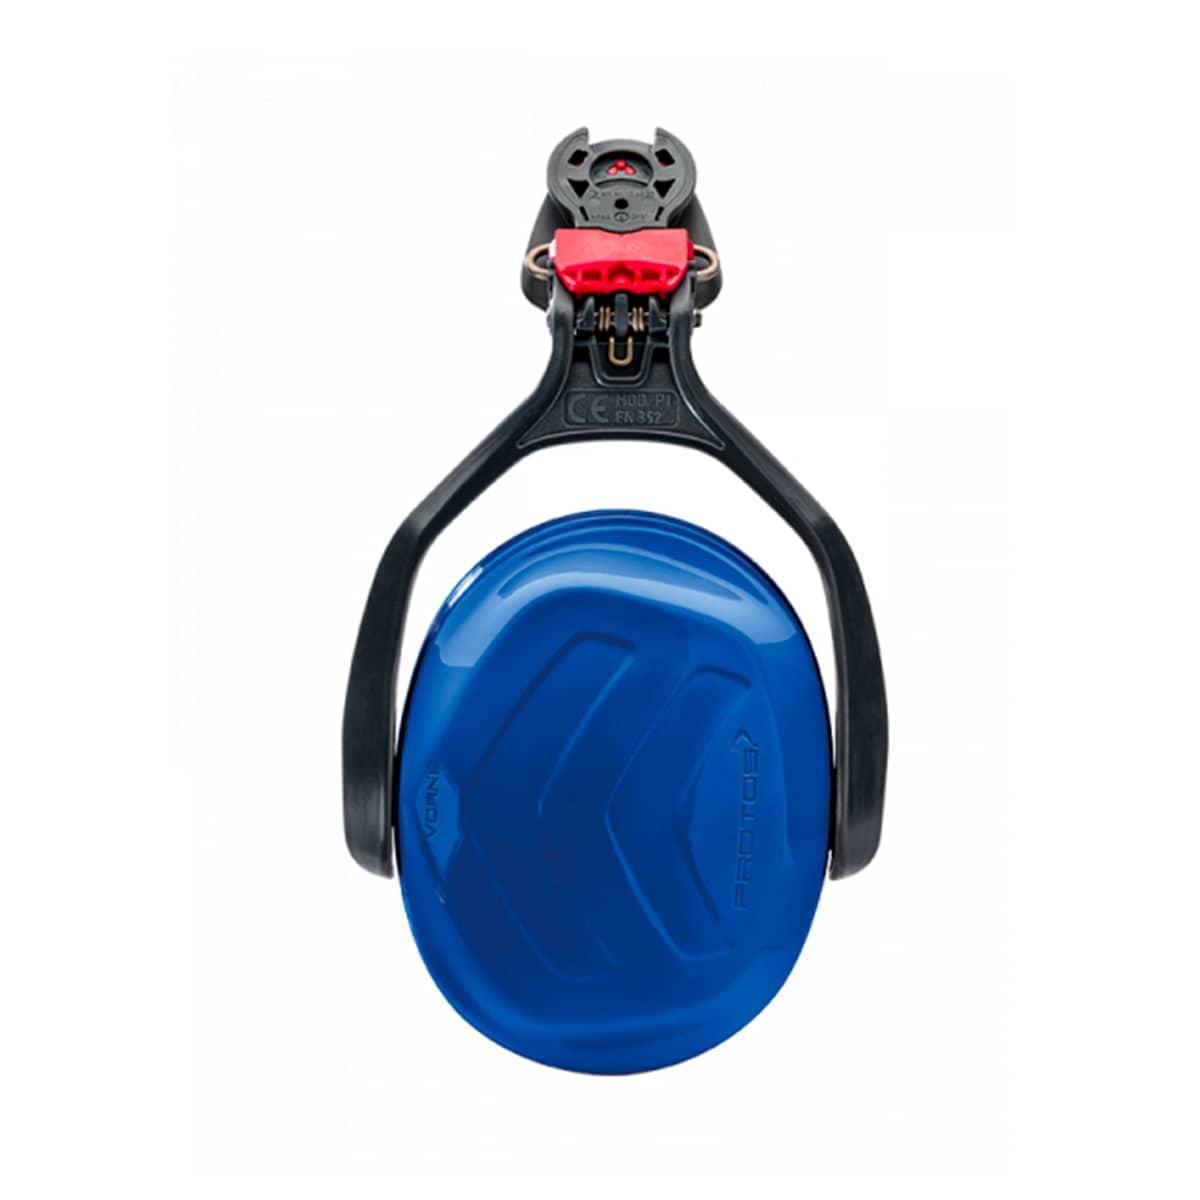 Casque Protos kit anti-bruit bleu